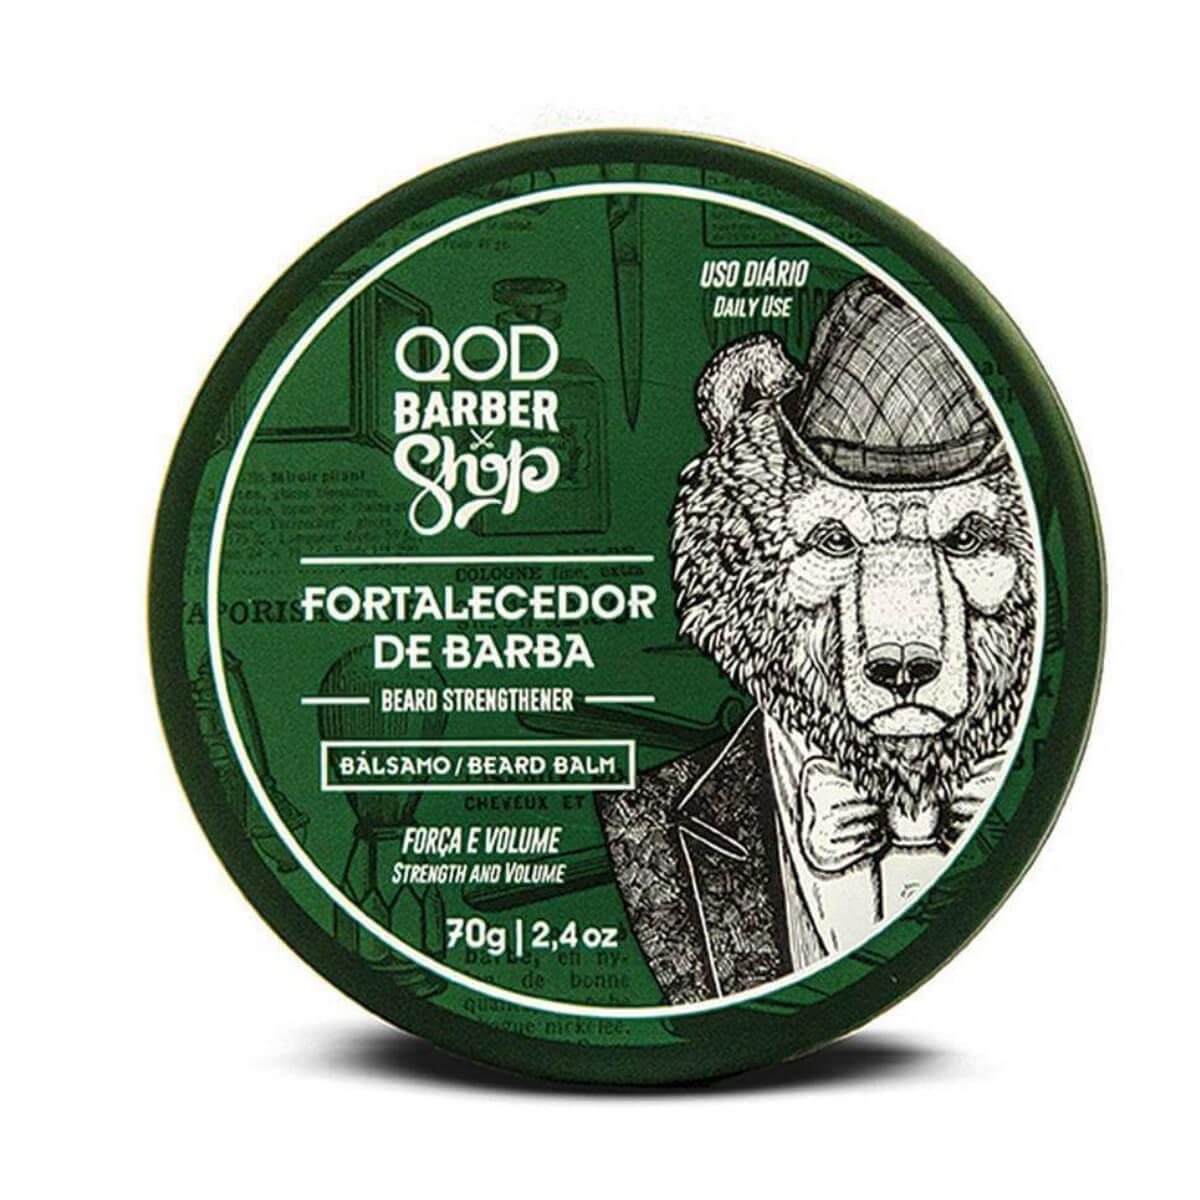 Bálsamo Fortalecedor de Barba QOD Barber Shop 70g